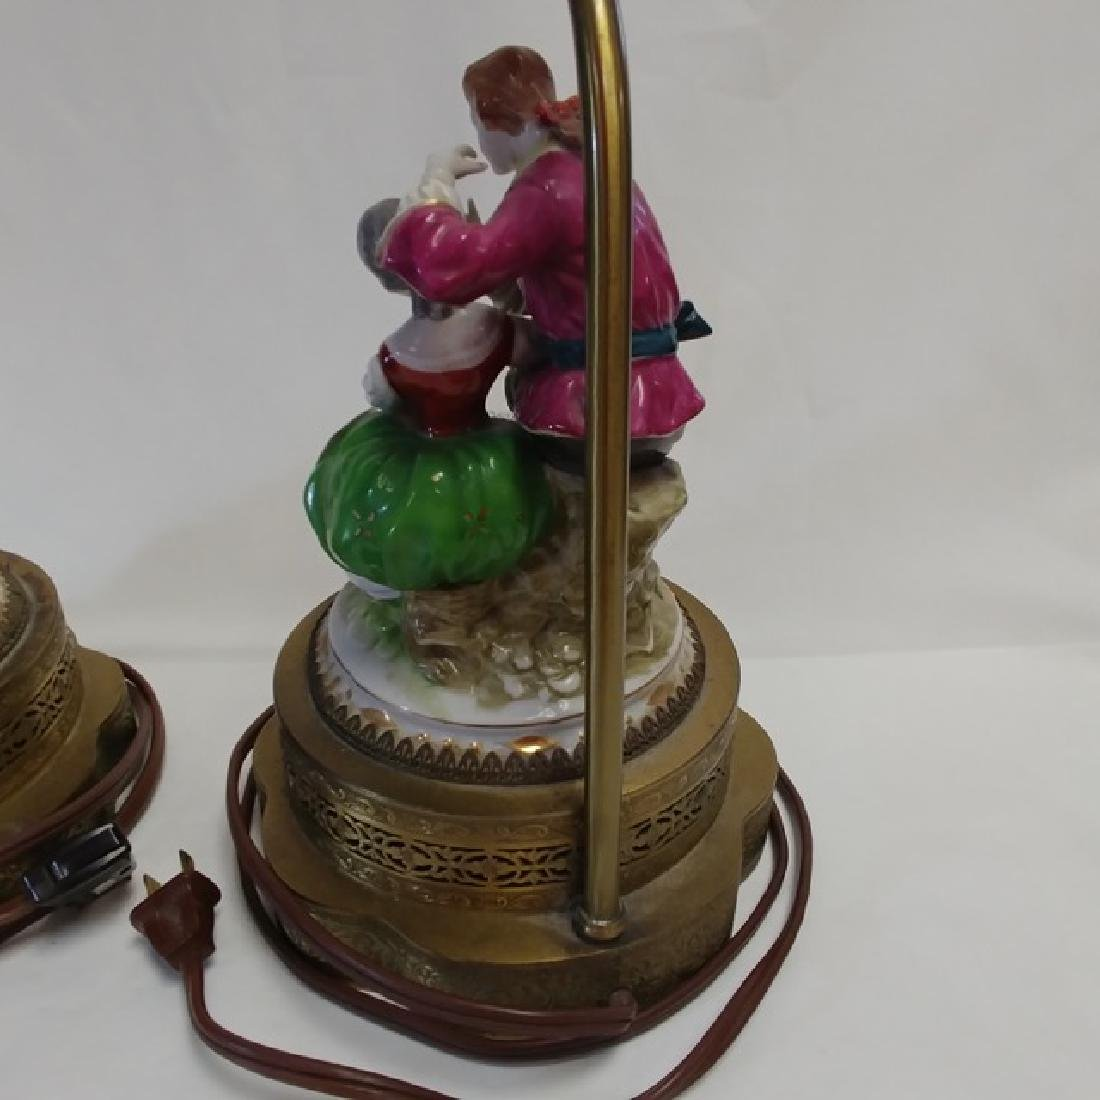 Pair Classical Porcelain Lamps - 6